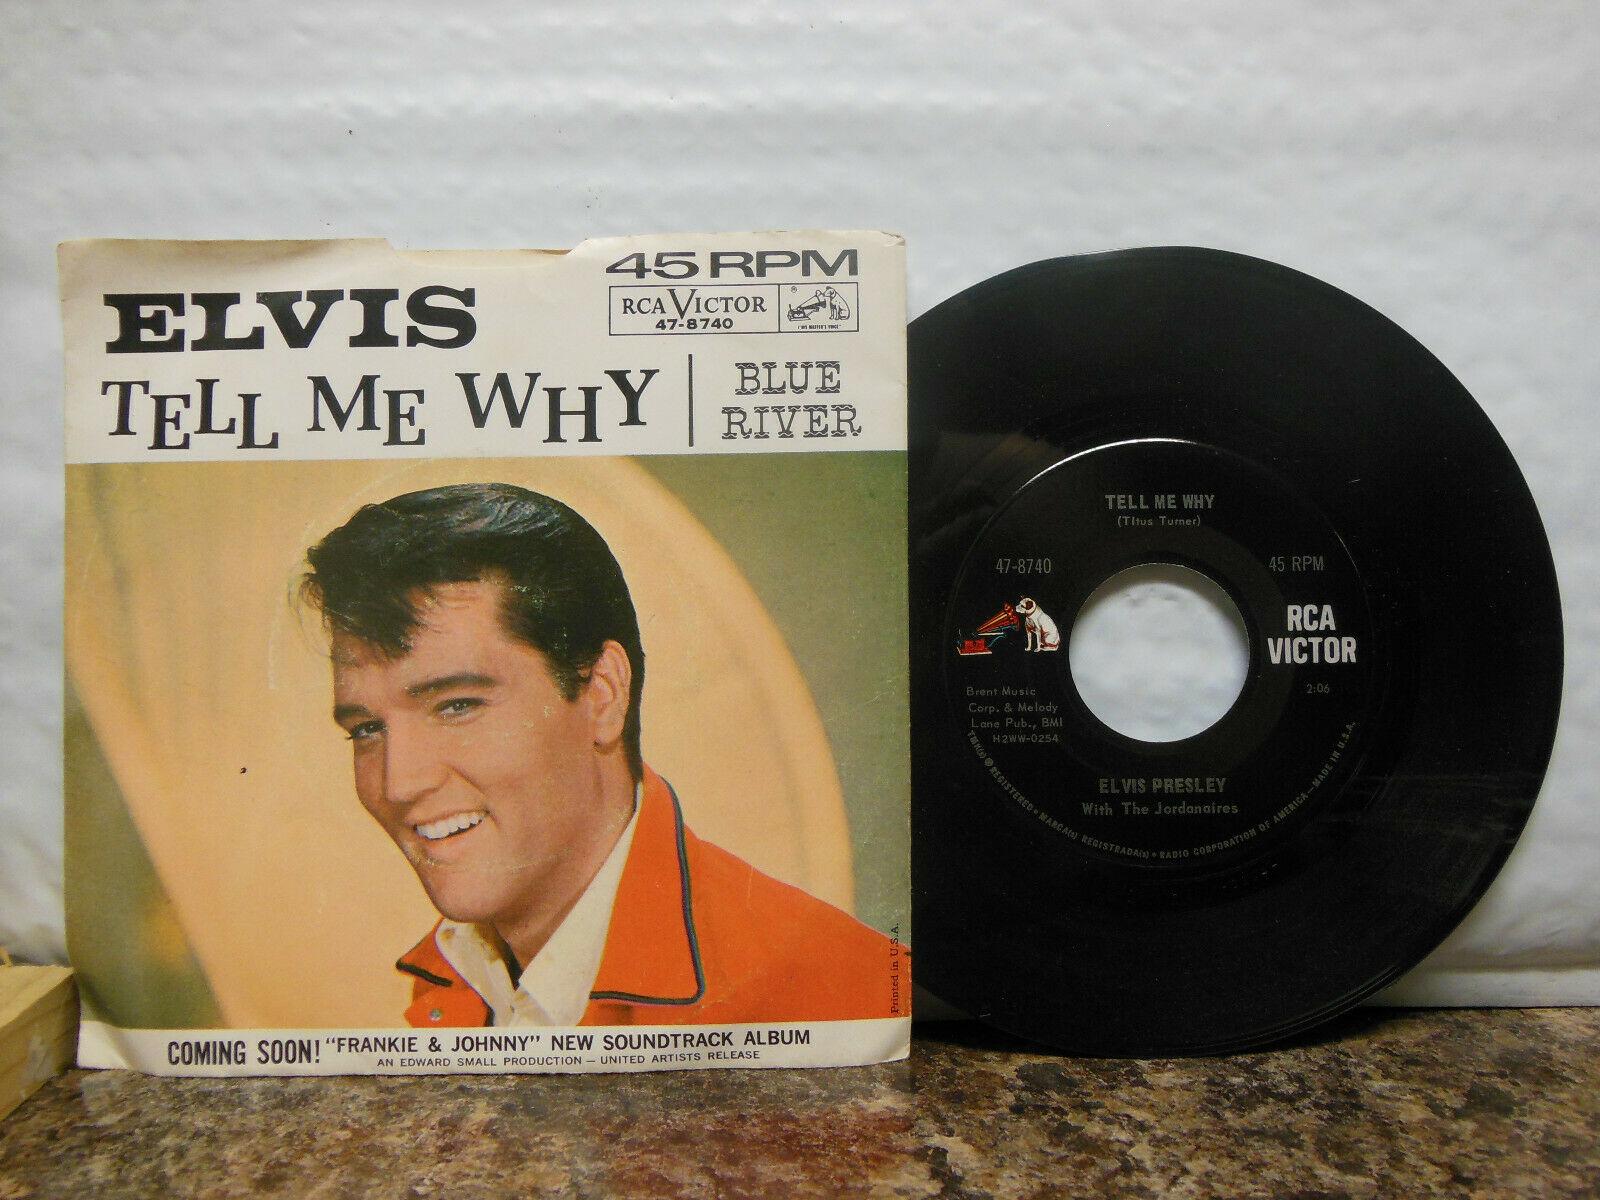 Elvis Presley - Blue River / Tell Me Why, 45 RPM VG+ (RC)